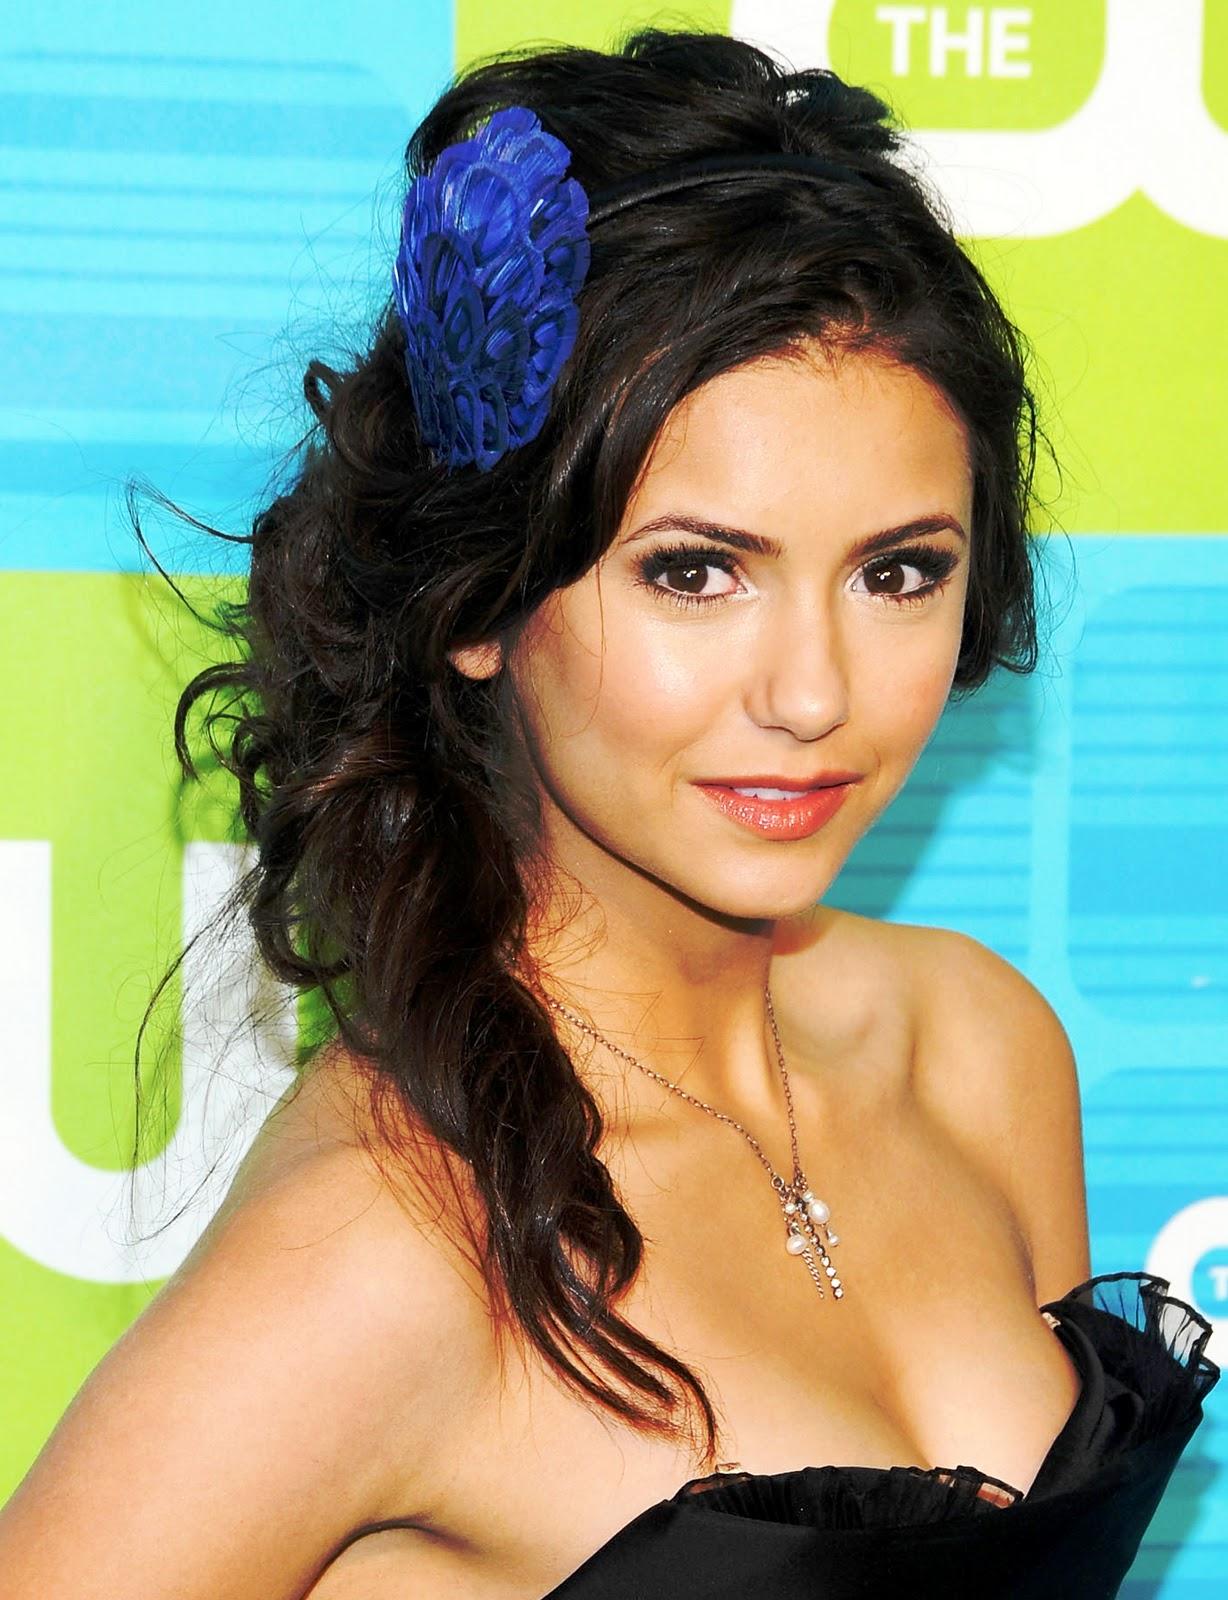 Nina Dobrev born in Sofia Bulgaria Moved to Toronto Ontario